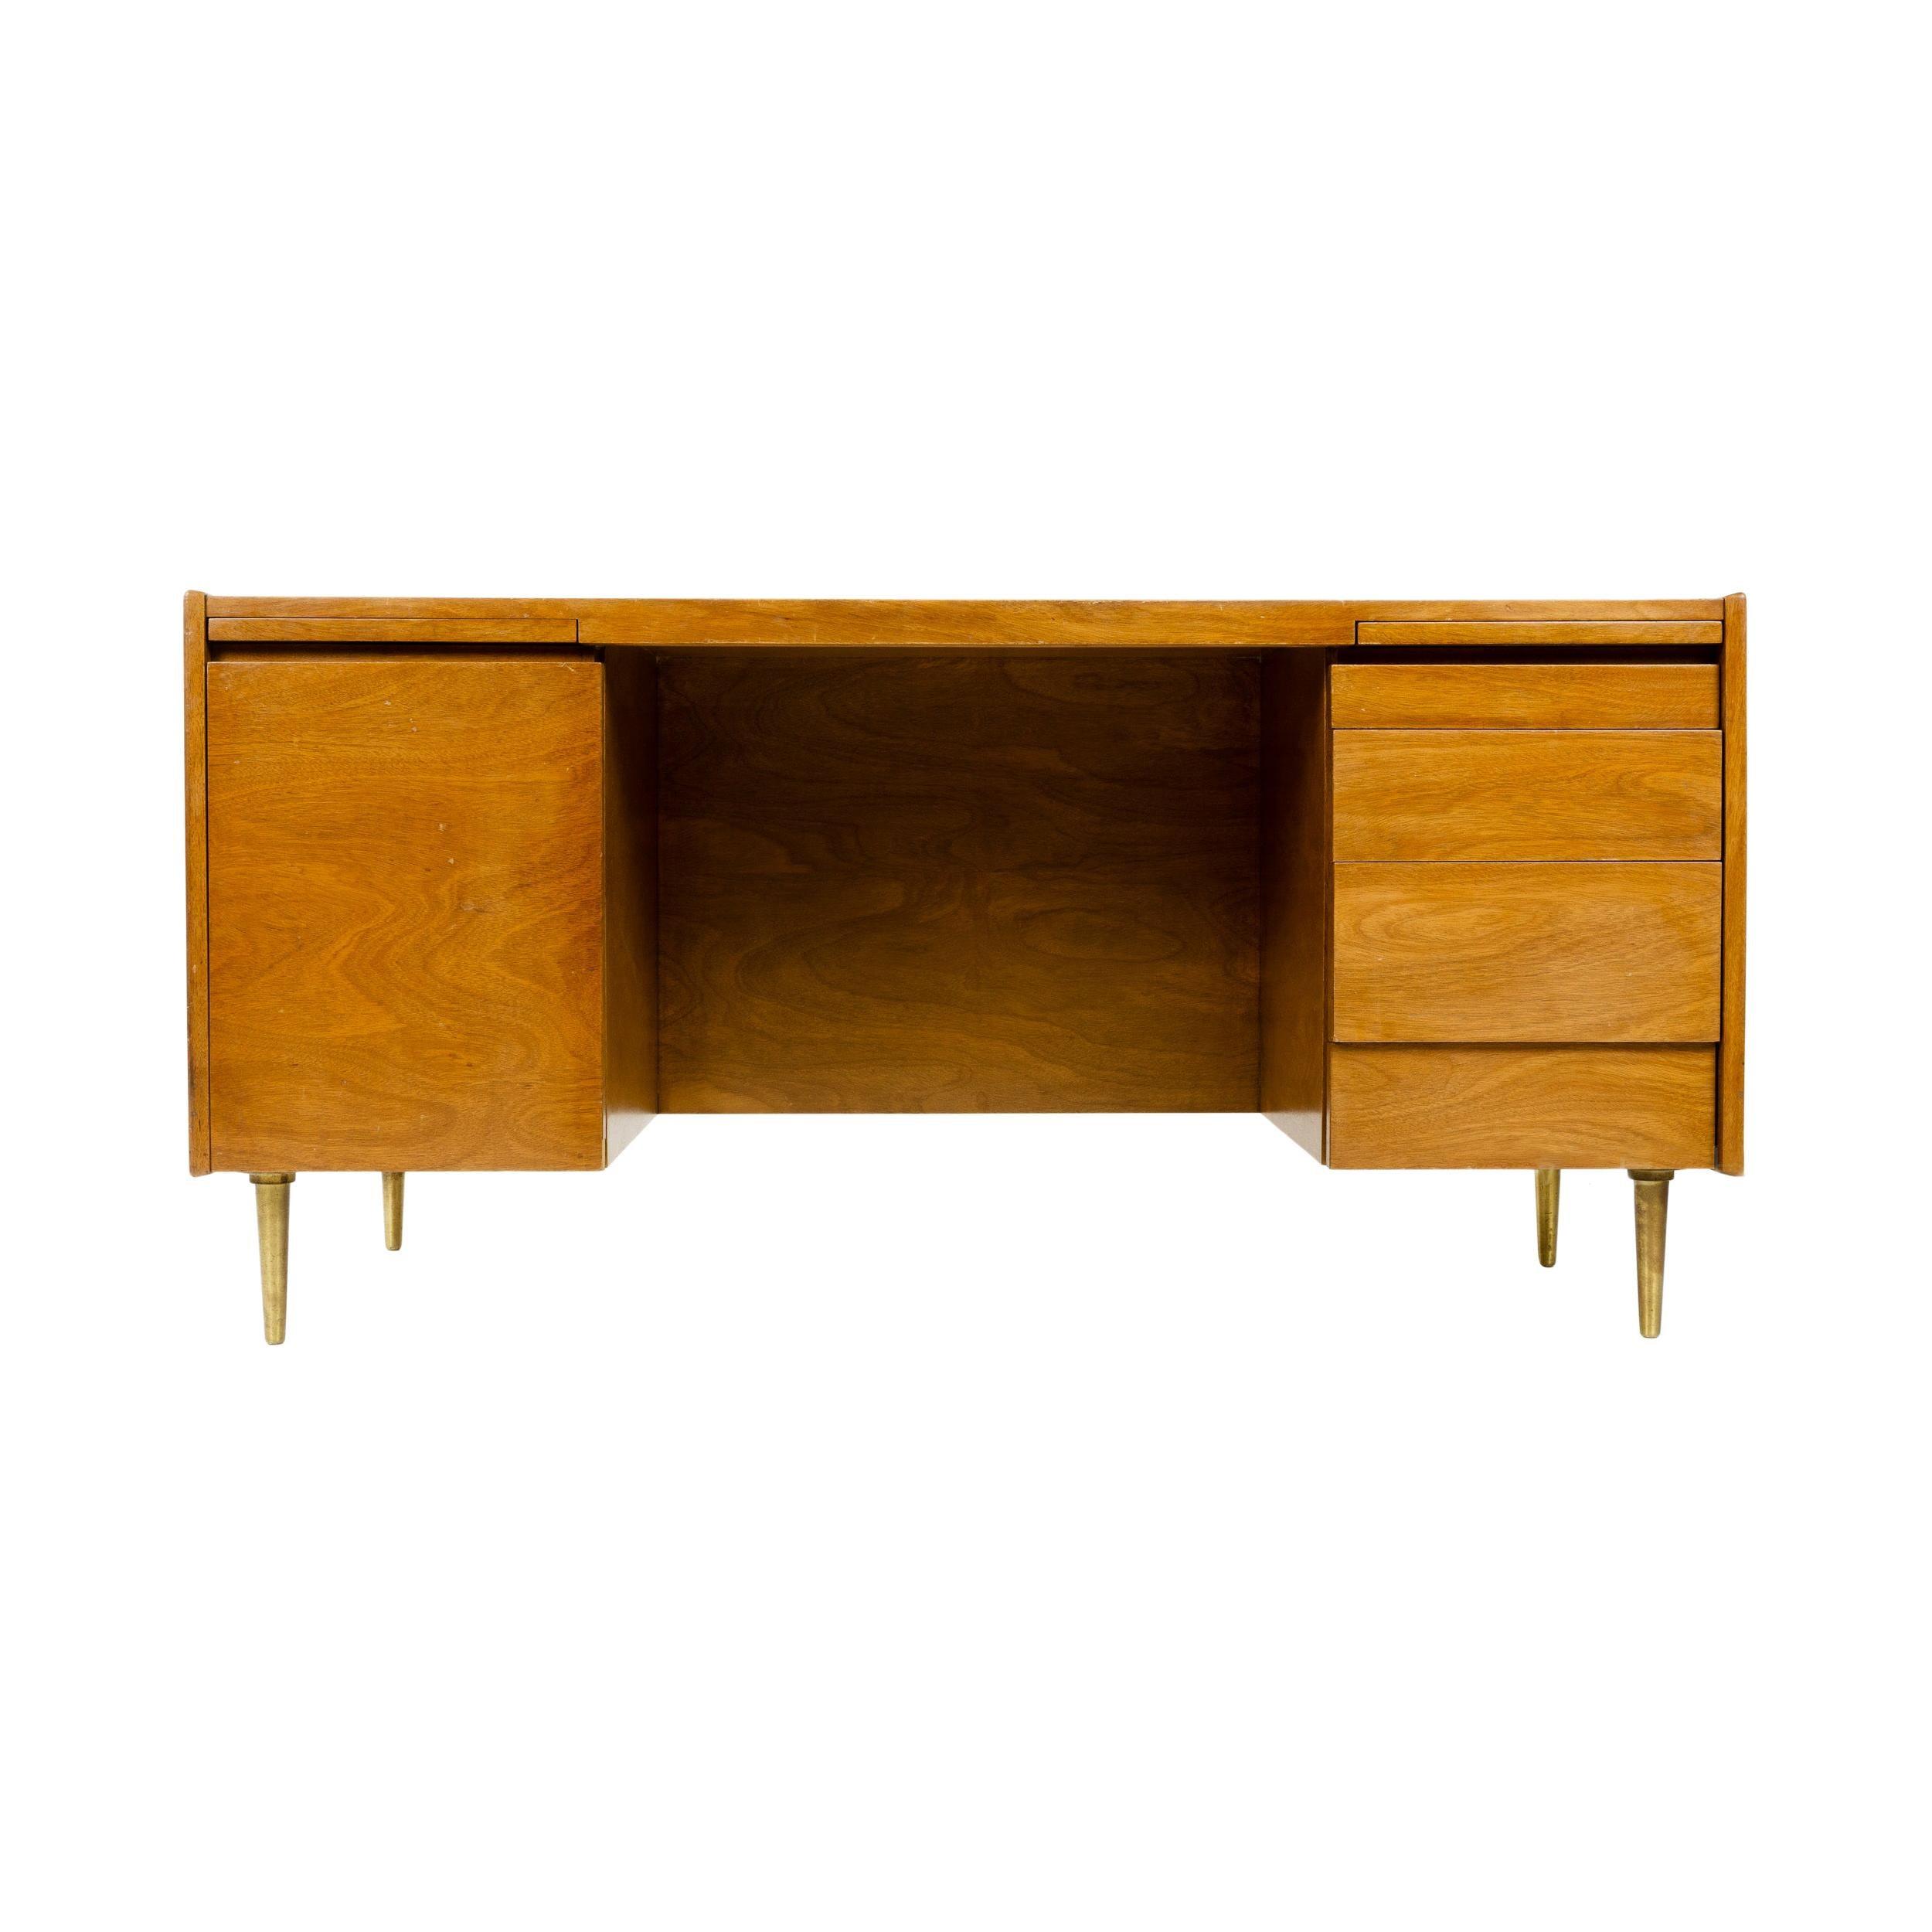 1950s Double Pedestal Desk by Edward Wormley for Dunbar